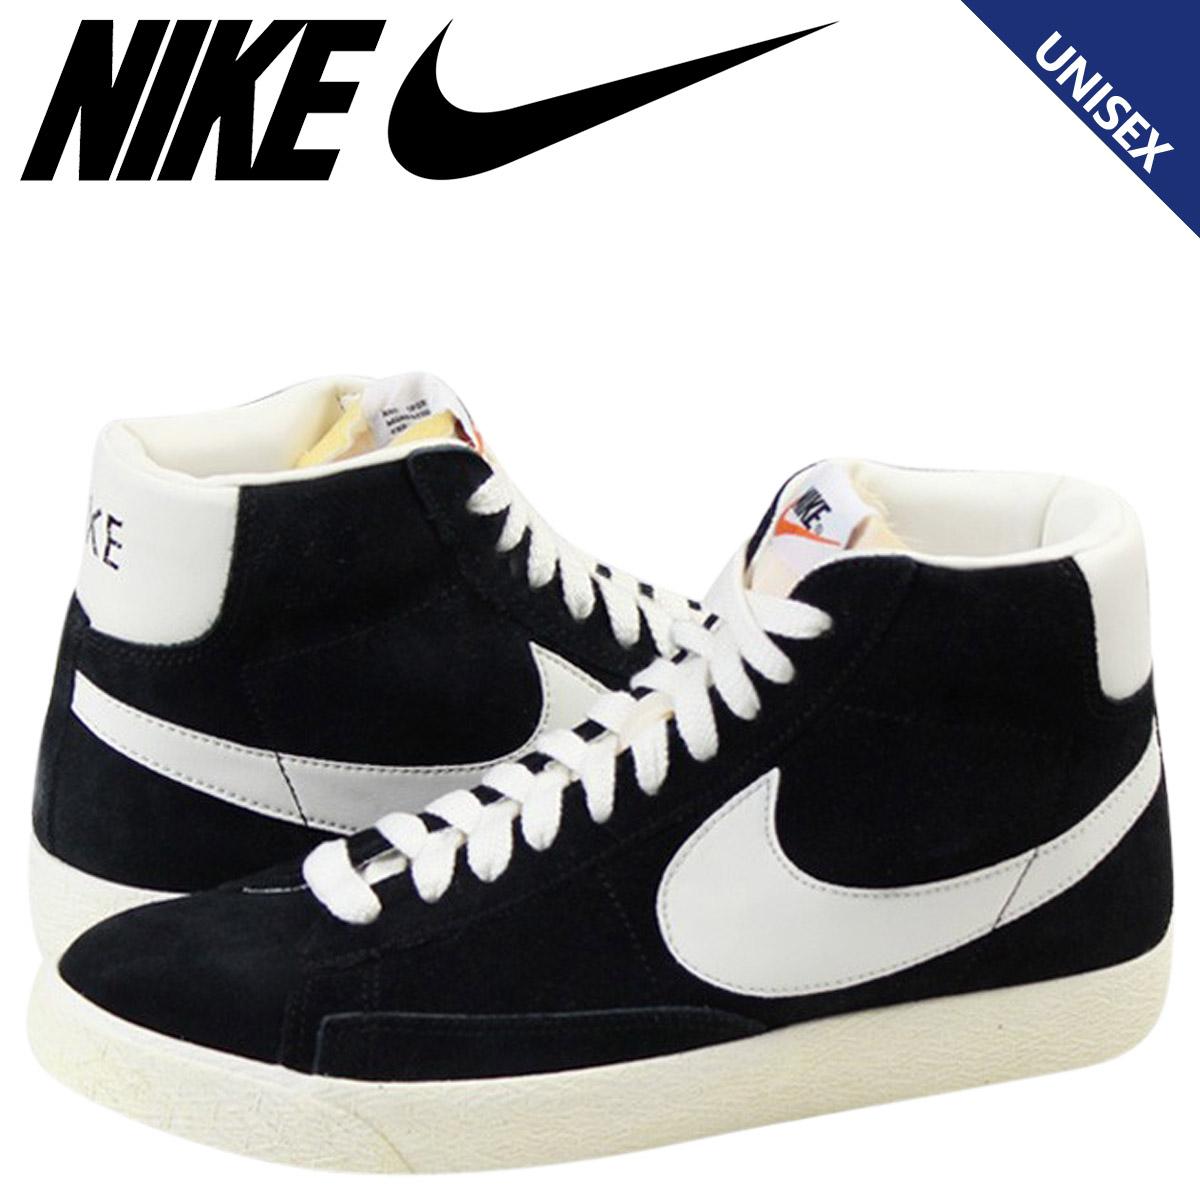 e777d4854a0ee 375,722-001 nike NIKE BLAZER HIGH VINTAGE SUEDE sneakers blazer high  vintage suede men gap Dis suede cloth unisex black [1/21 Shinnyu loads] ...